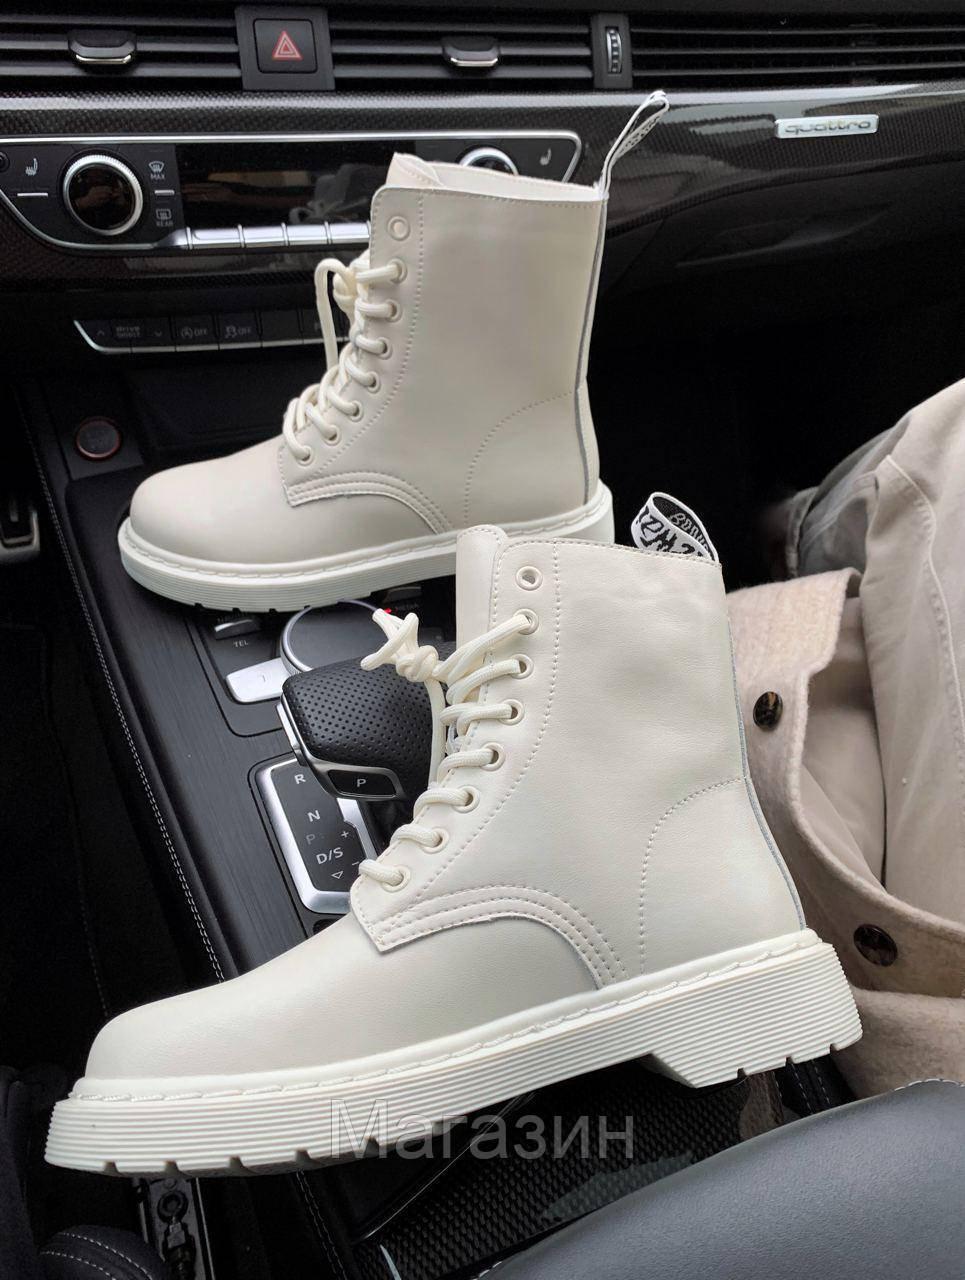 Женские зимние ботинки Dr. Martens 1460 White Доктор Мартинс без меха белые Мартинсы